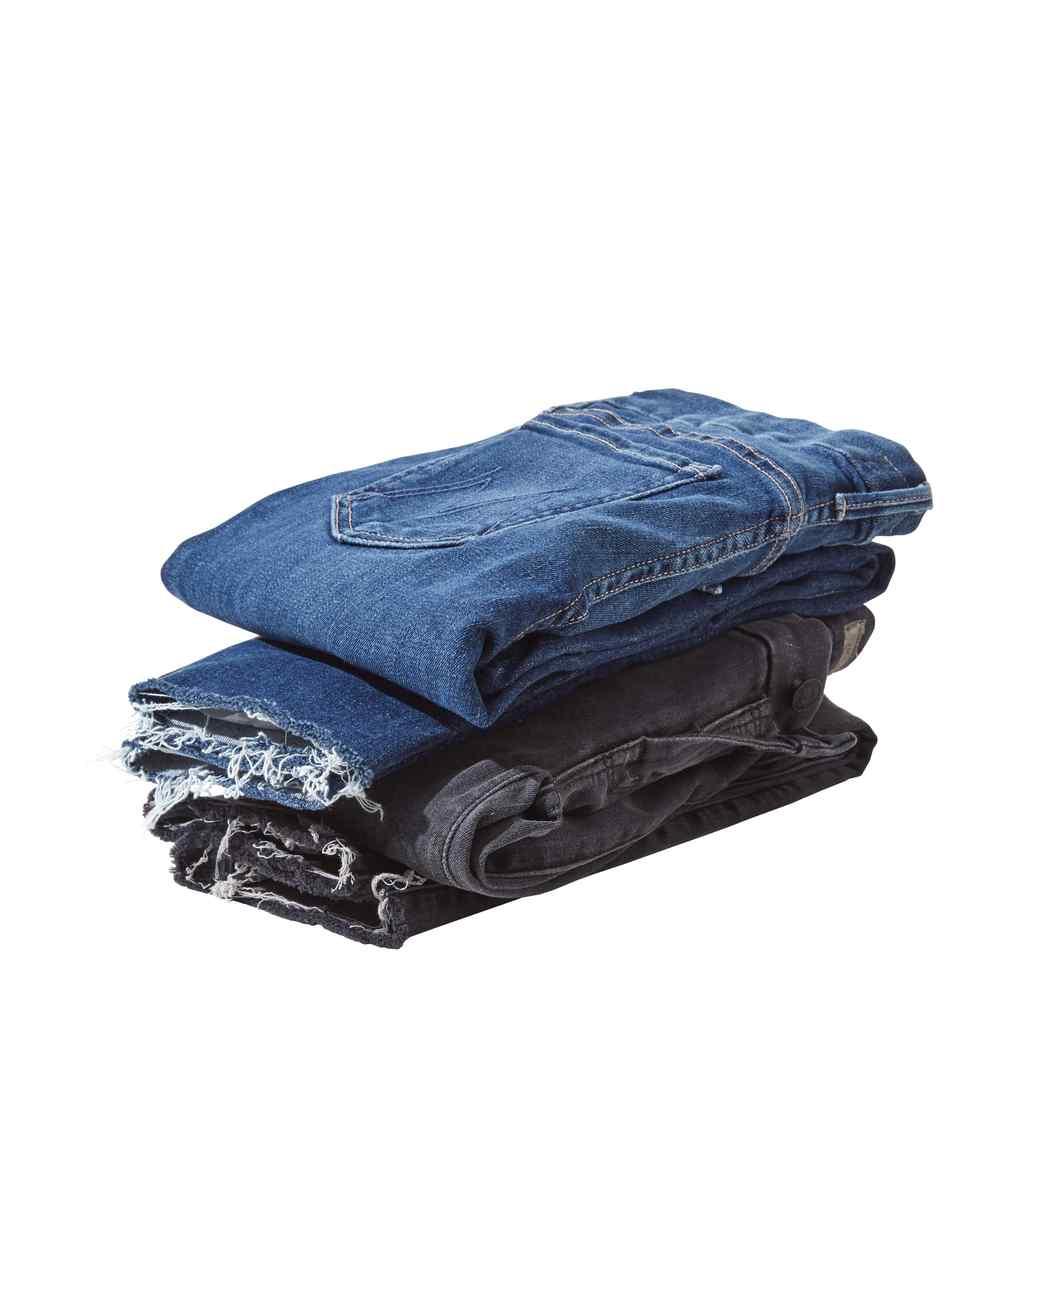 jeans-328-d112983_l.jpg